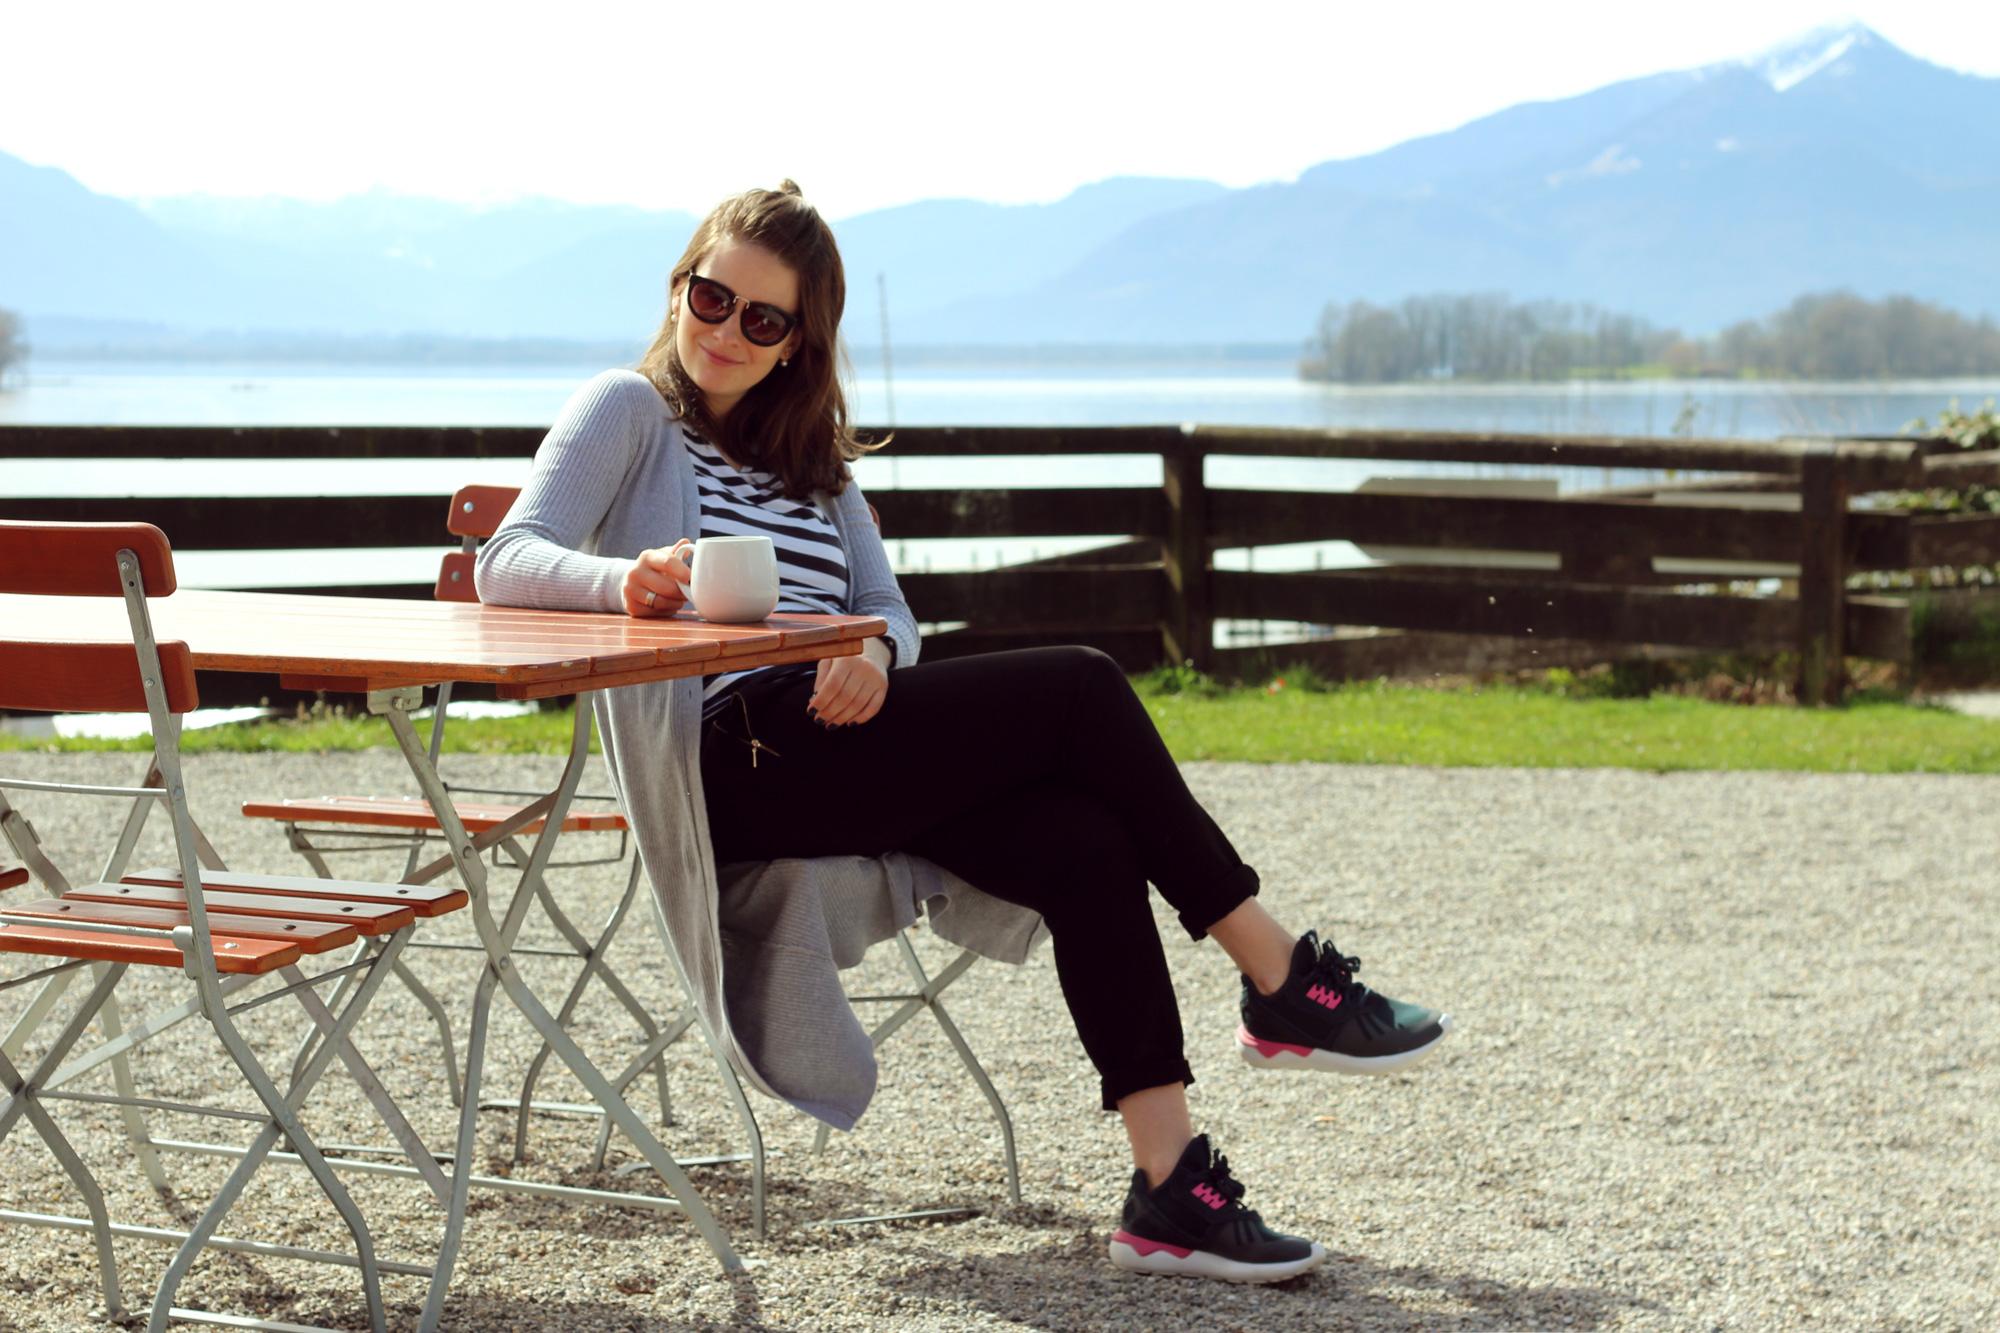 Cheimsee-lake-Bayern-weekend-escape-8